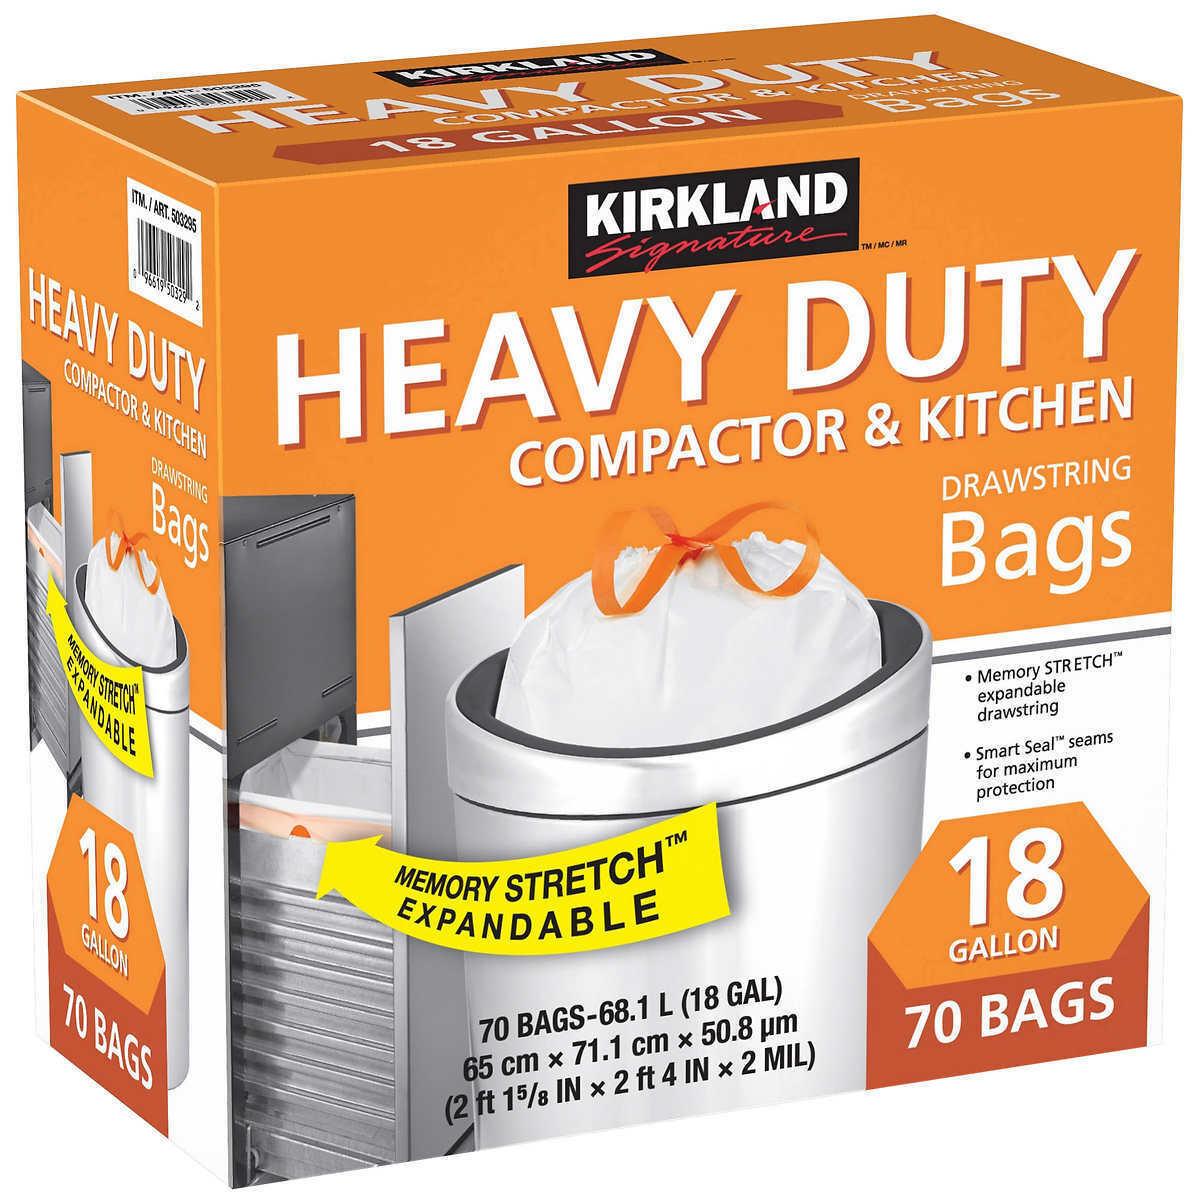 18 Gallon Compactor and Kitchen Trash Bag 70 Ct Garbage Heav